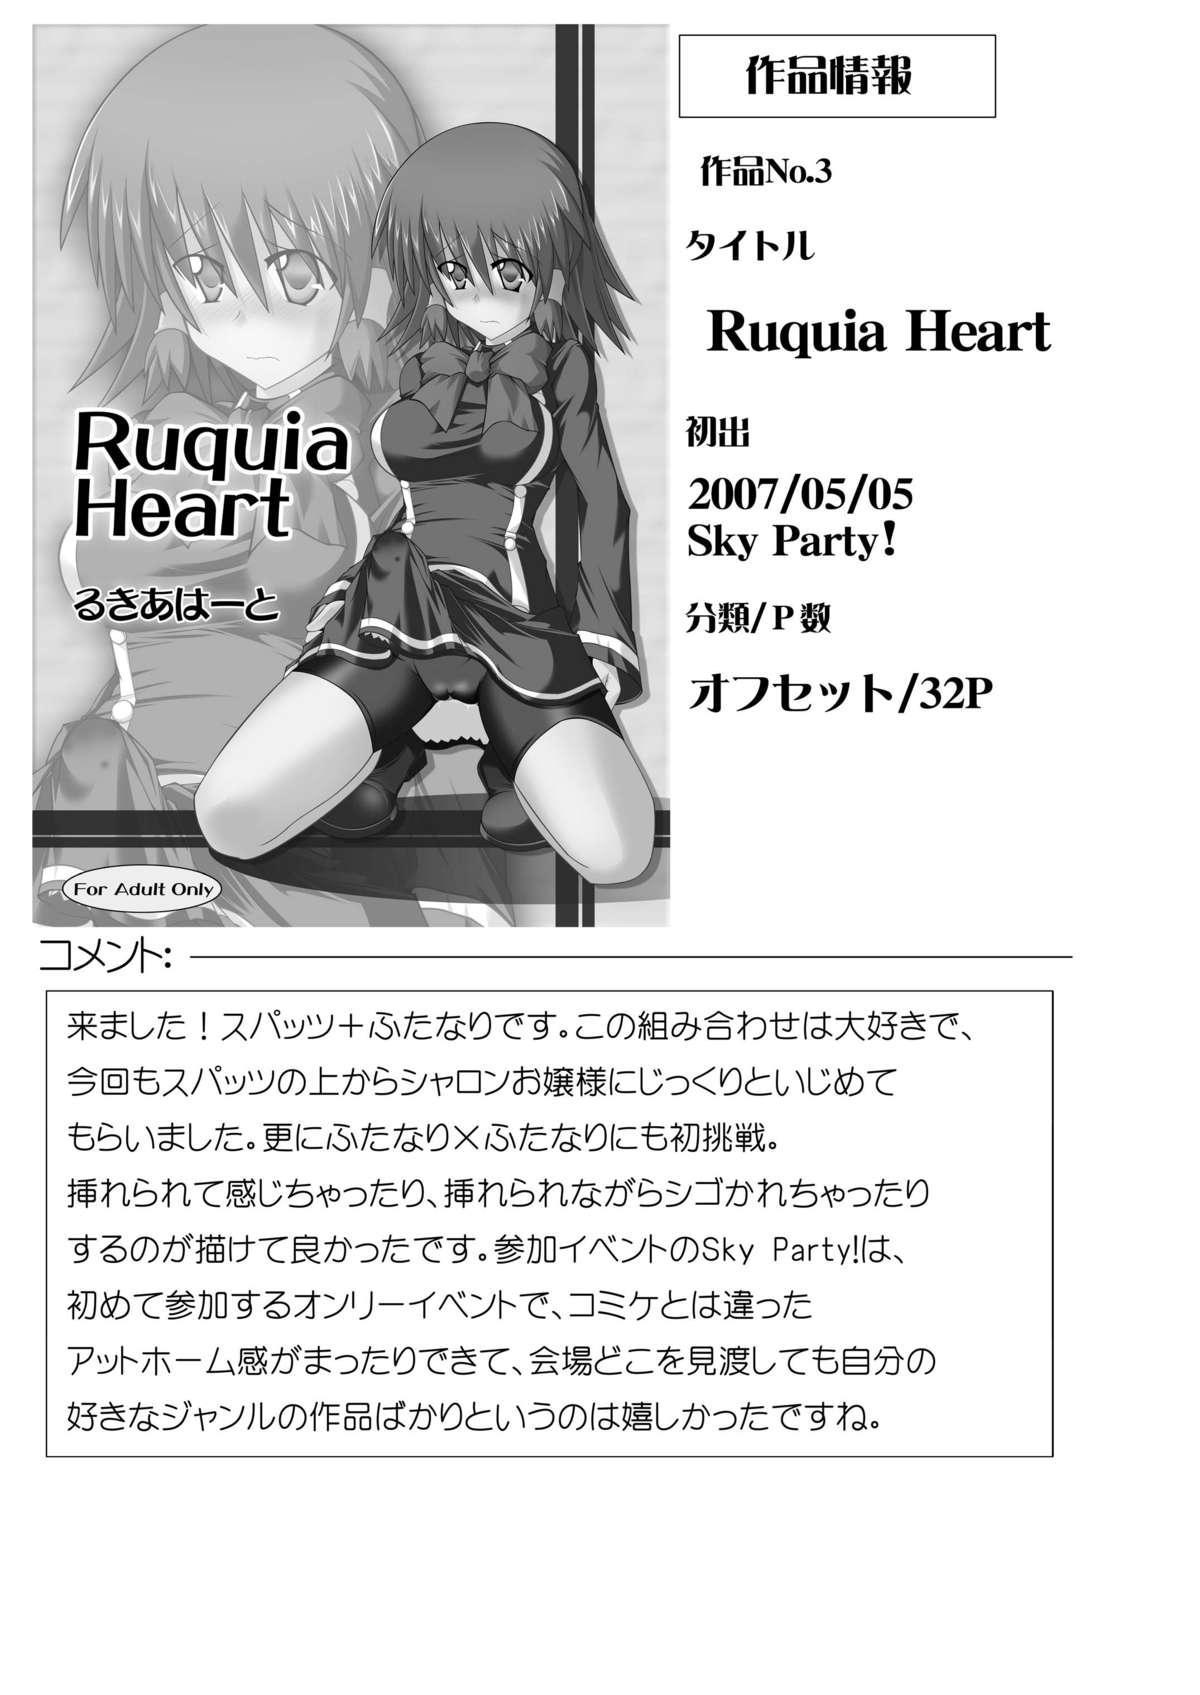 Stapspats QMA Soushuuhen 1: Marugoto Issatsu! Ruquia Hon!! 72